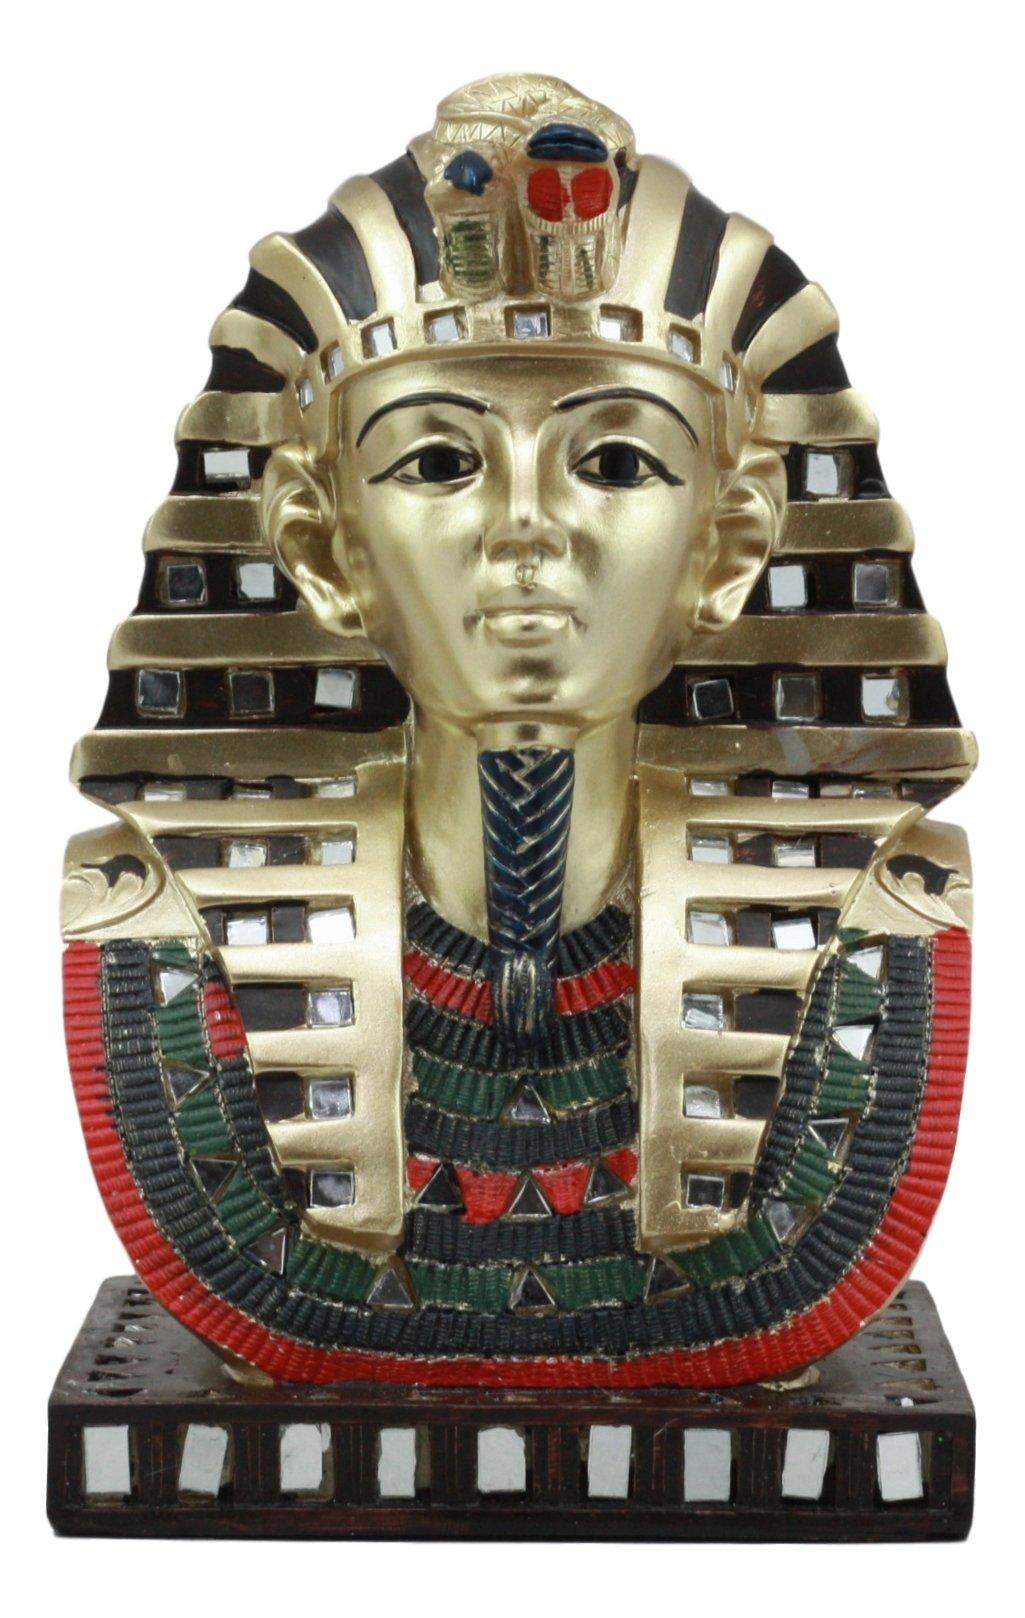 Ebros Ancient Egyptian Pharaoh Mask Of King Tut Statue Golden Tutankhamun Bust Figurine by Ebros Gift